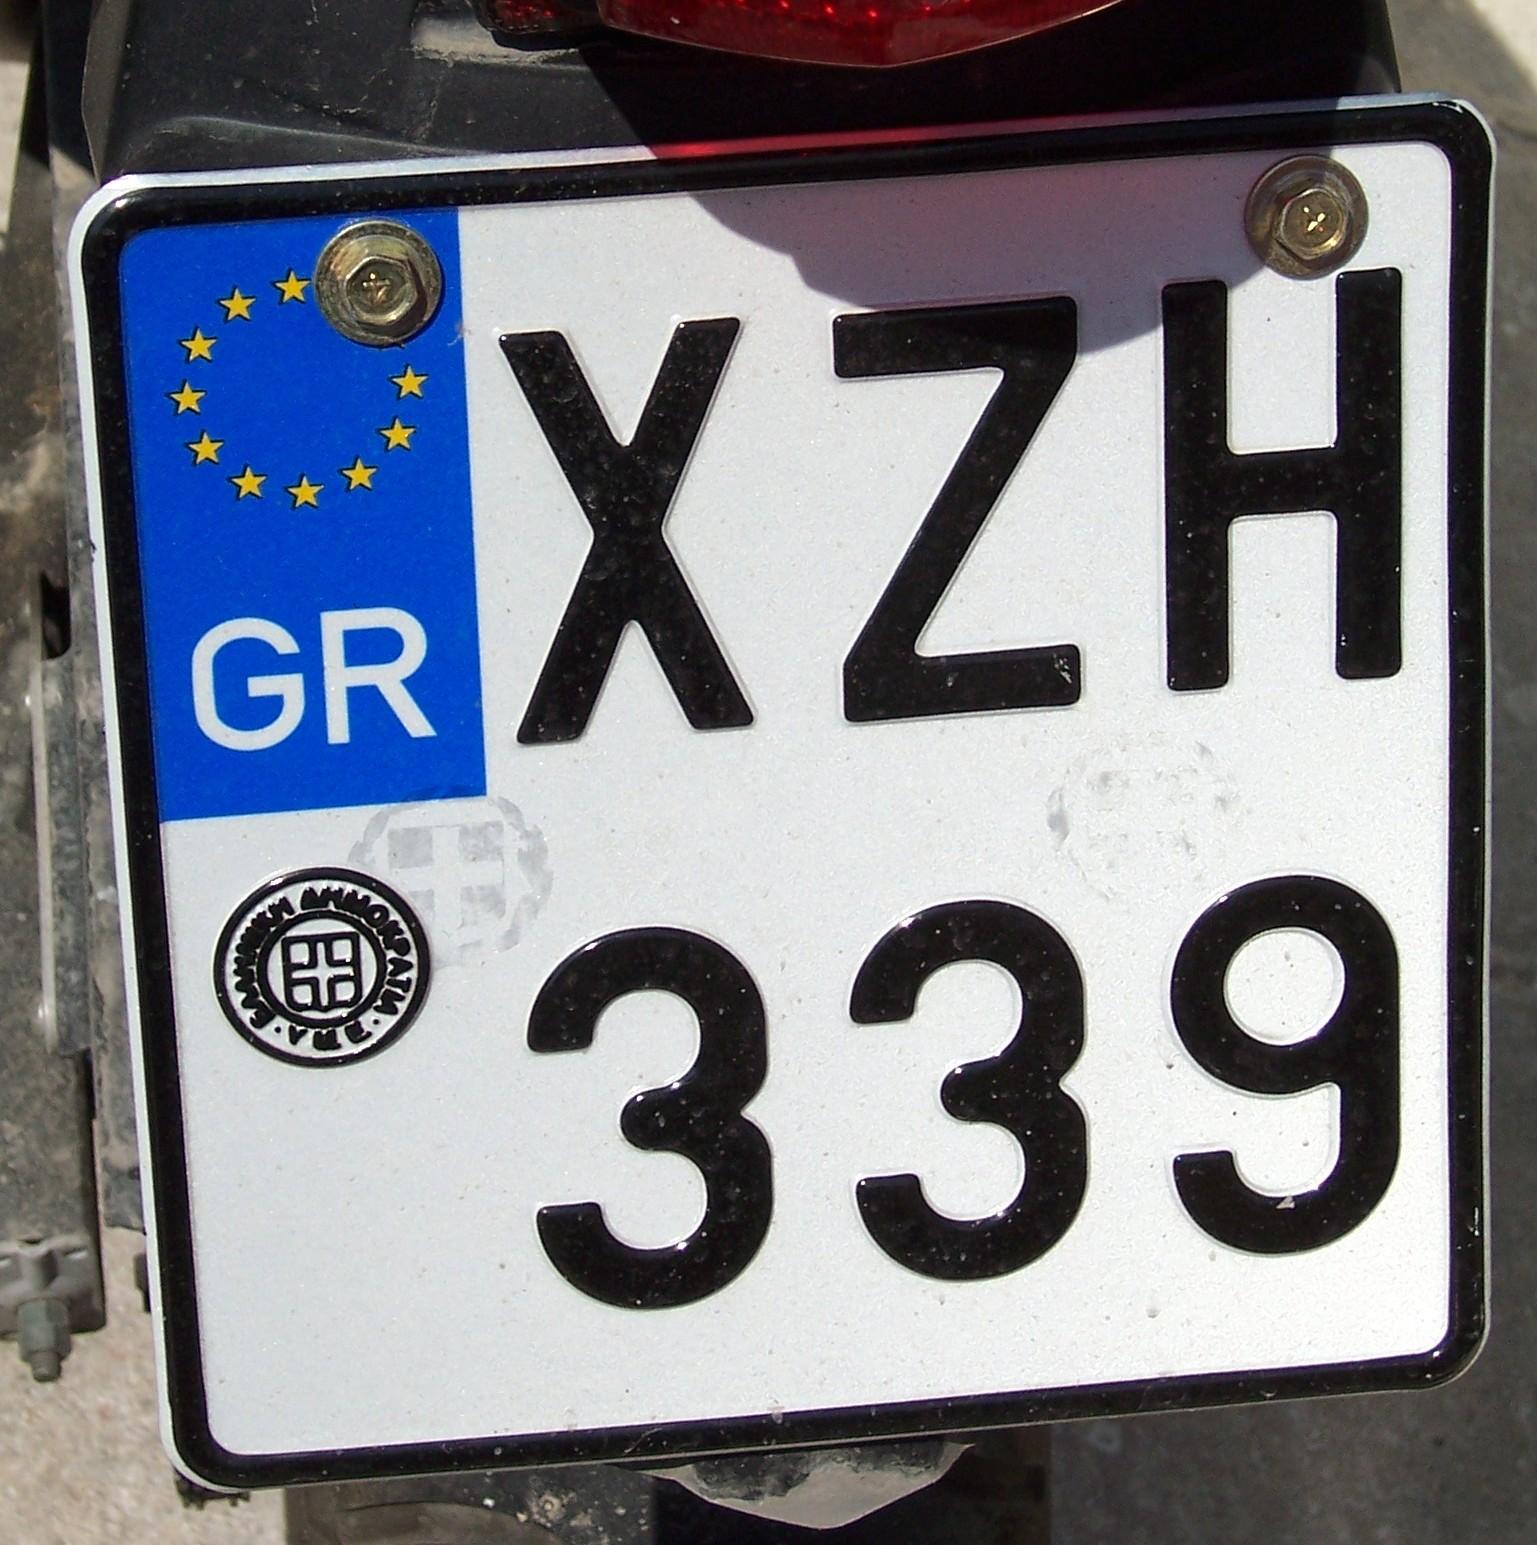 Greek licence plate